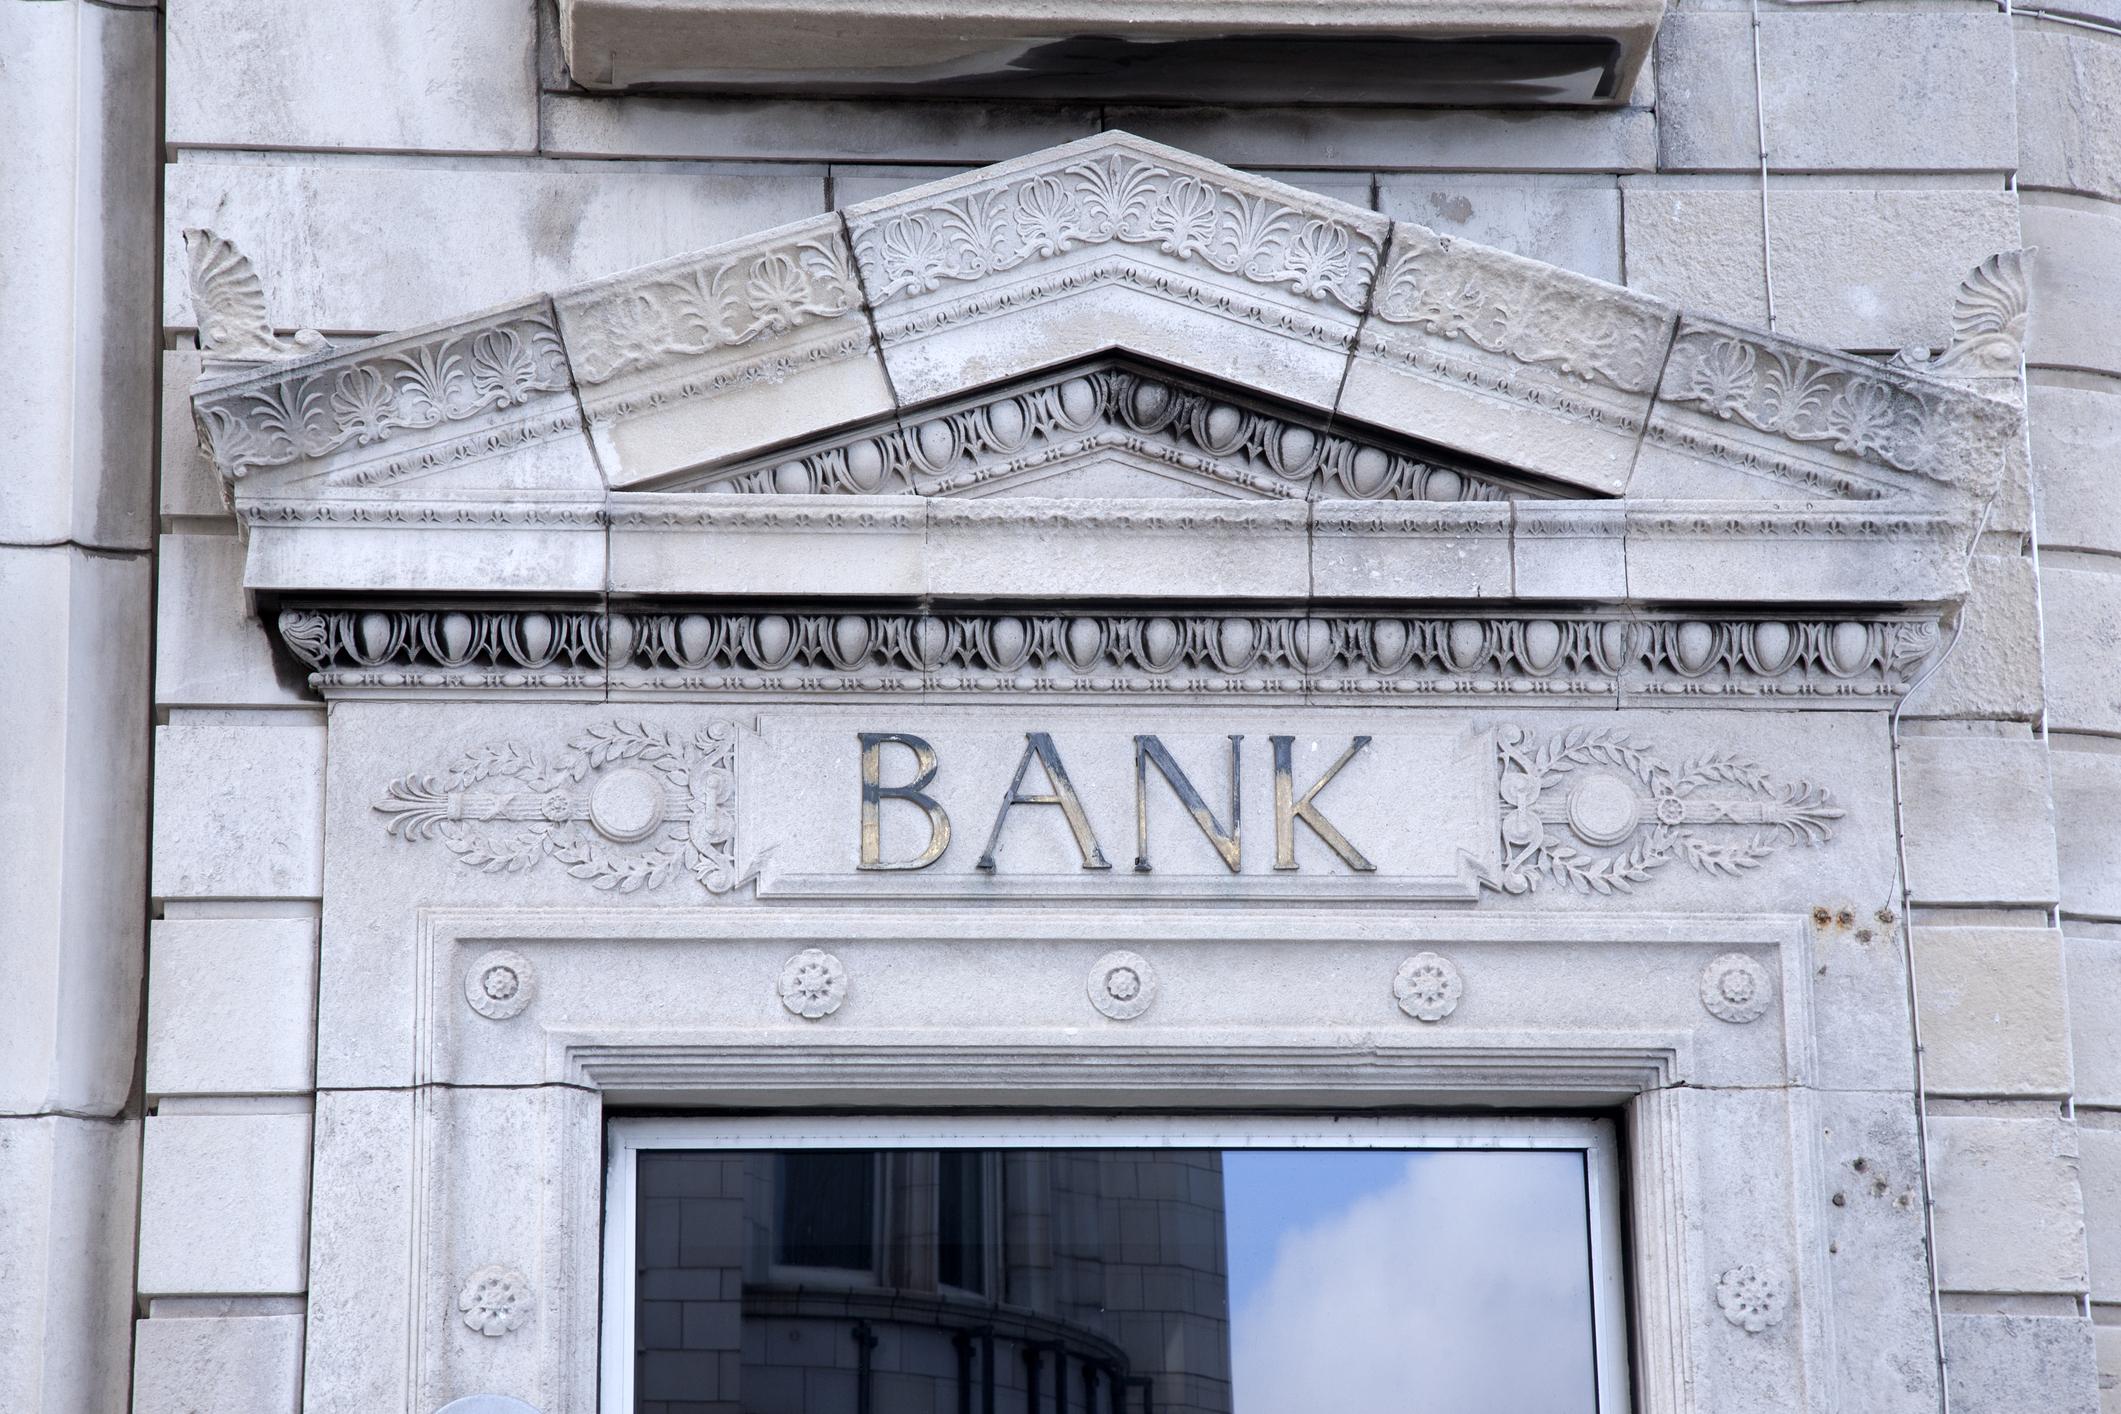 A bank building